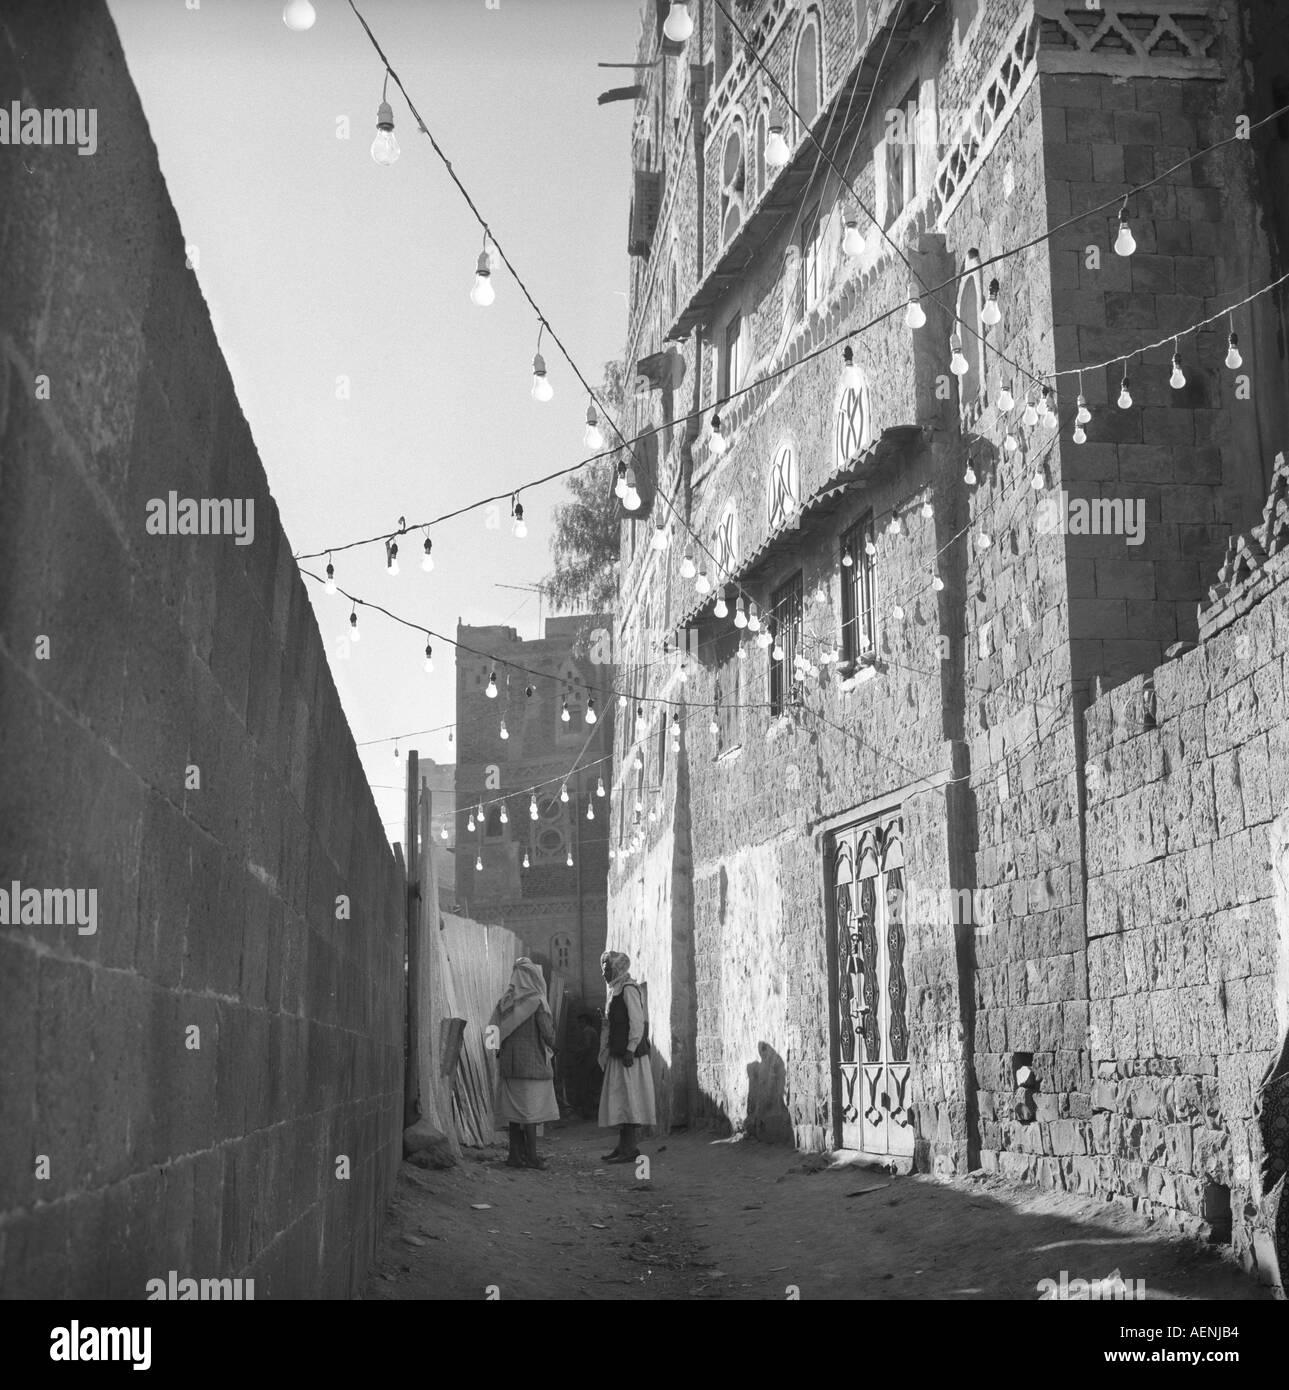 Early morning street scene Sanaa Yemen Arab Republic - Stock Image